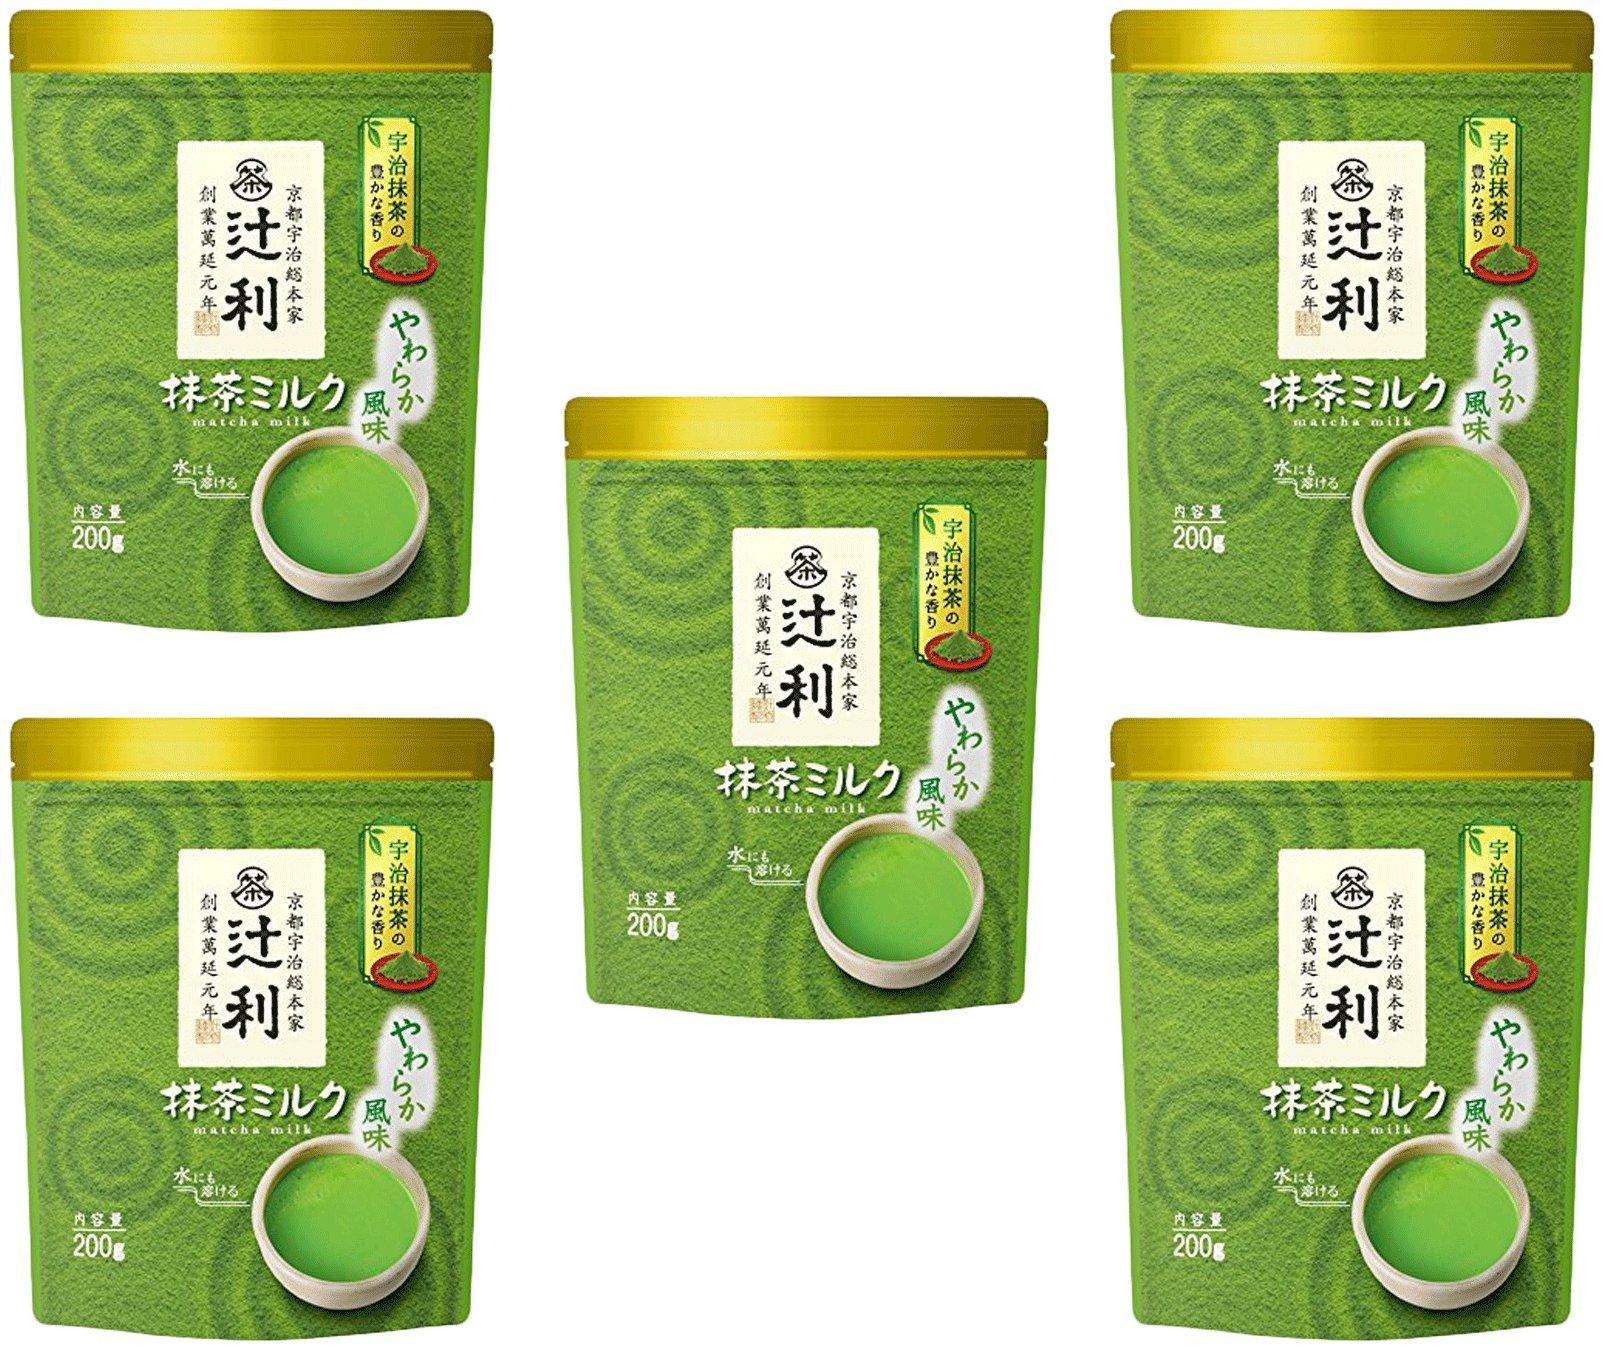 5 of Kataoka - Matcha Green Tea Milk 705oz [Imported by ☆SAIKO JAPAN☆ W/ Tracking #]